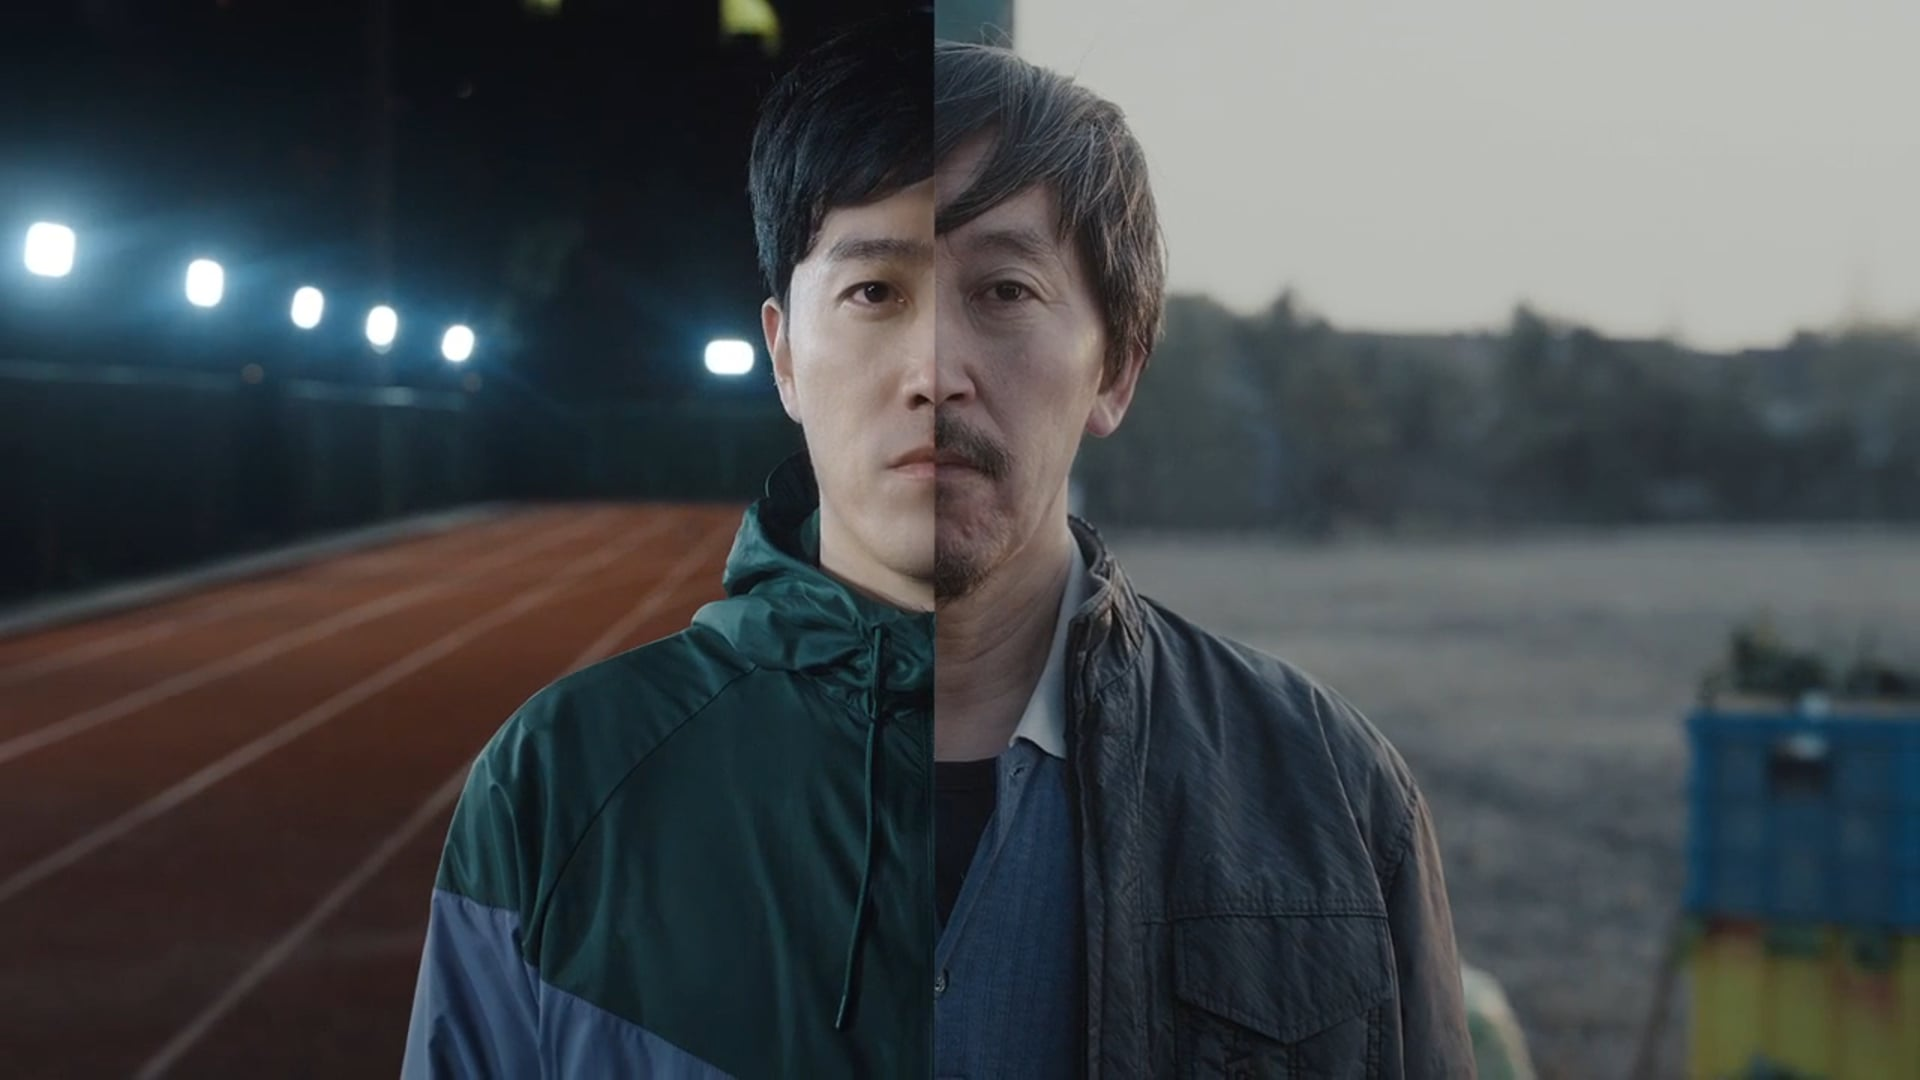 聚划算 刘翔 JuHusaSuan featuring Liu Xiang